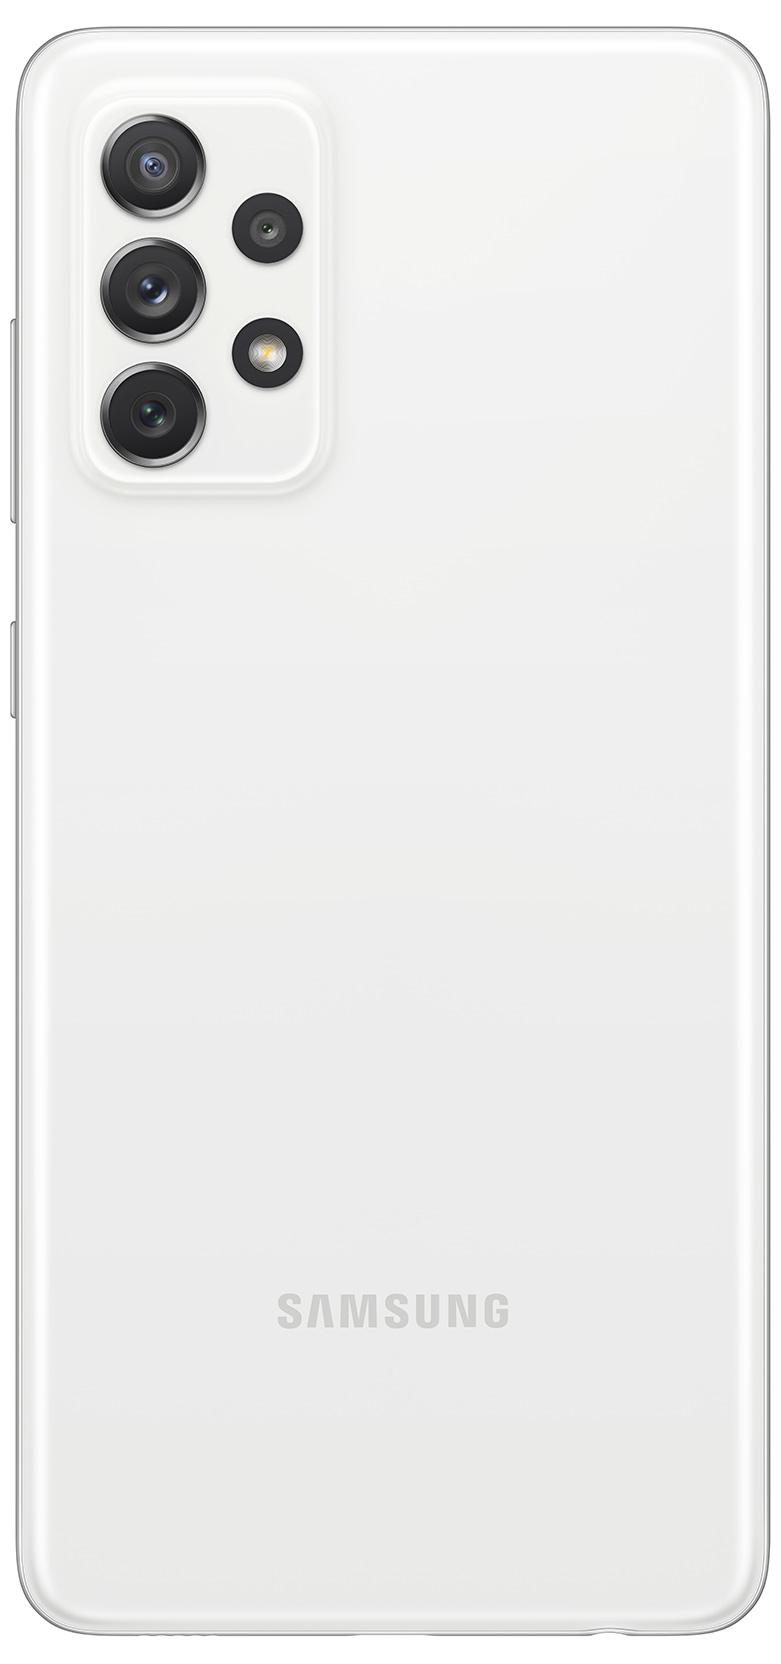 Samsung Galaxy A72 DS (SM-A725) 256GB White - 3